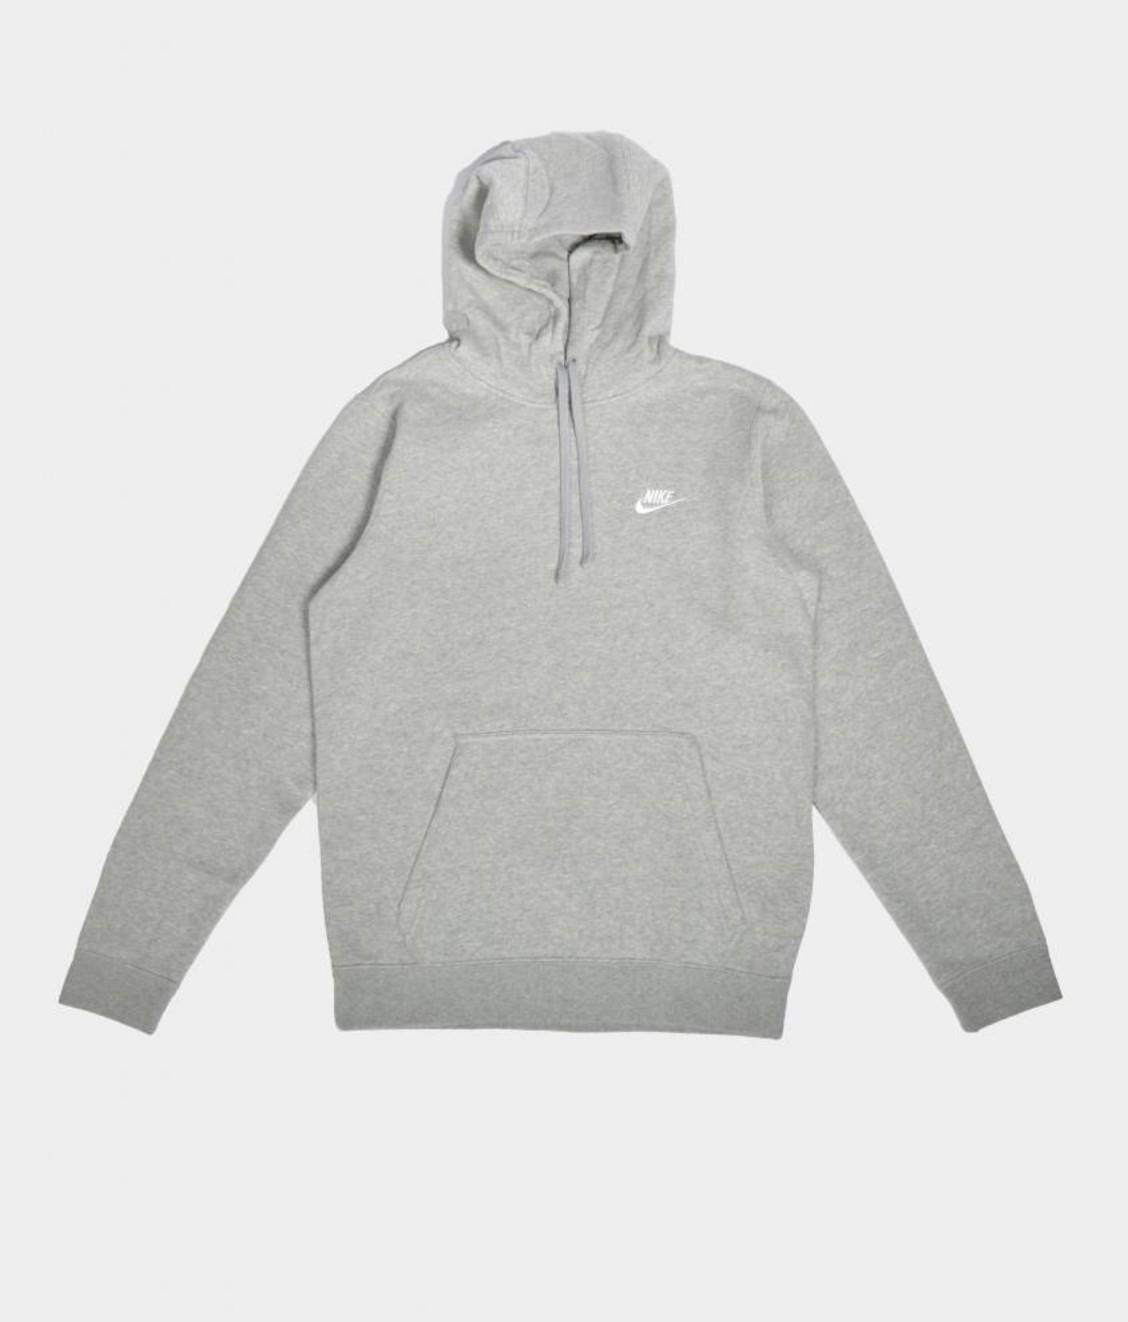 Nike Nike Sportswear Hoodie Grey